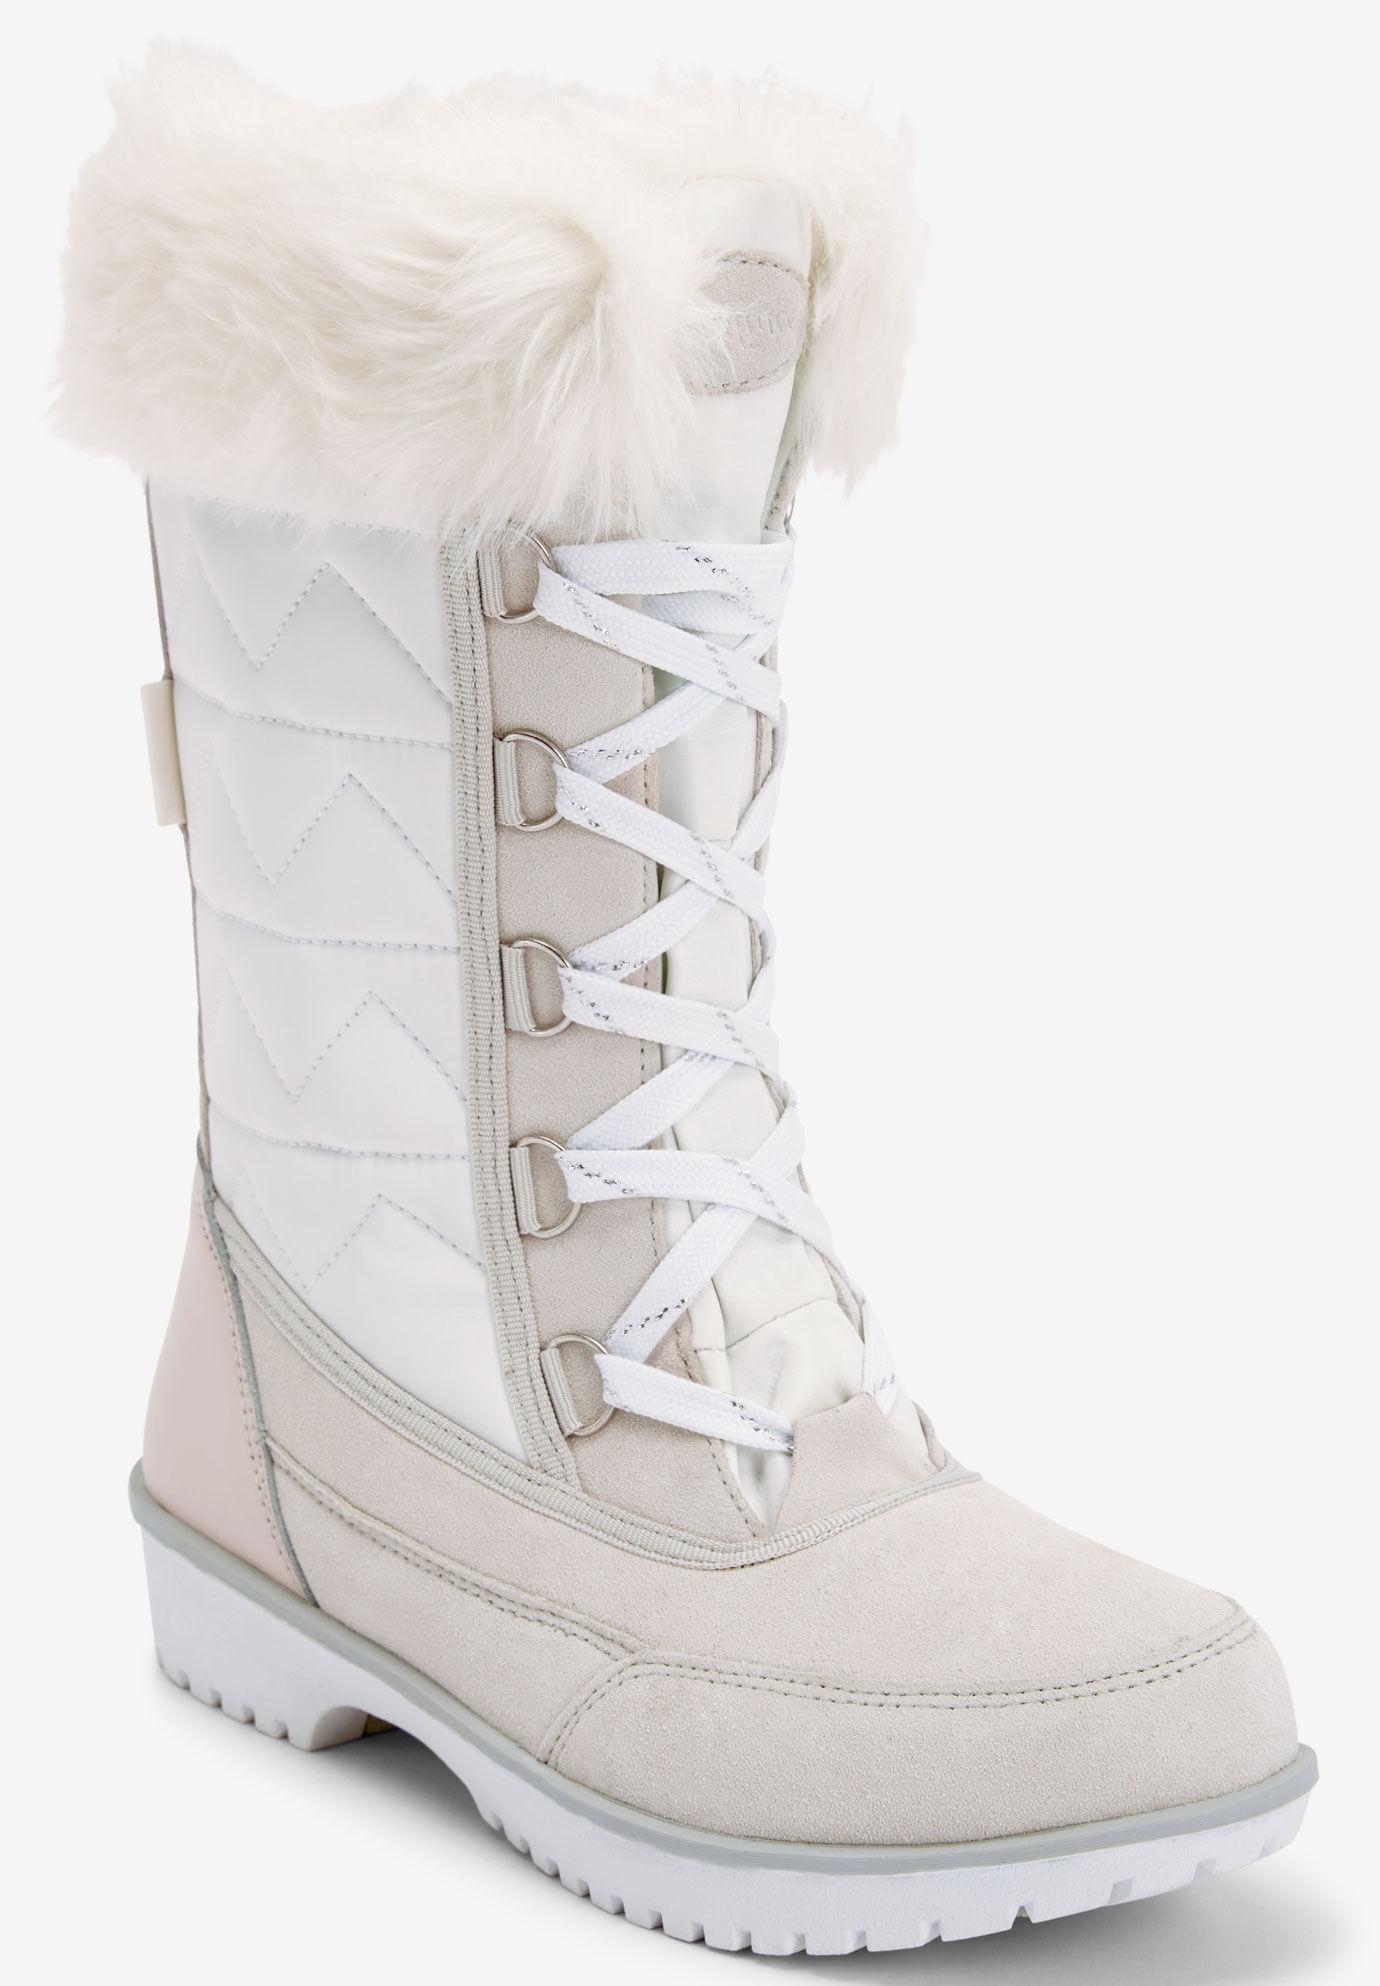 Wide Width Winter Boots for Women